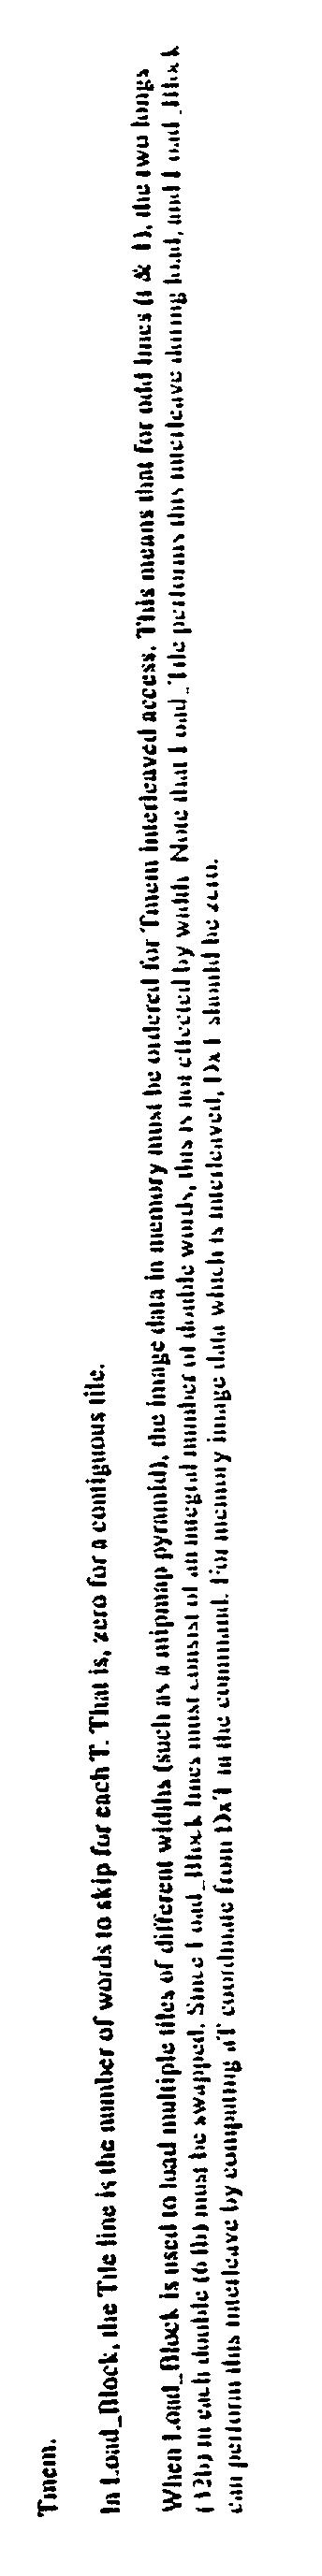 Figure US20030080963A1-20030501-P00010